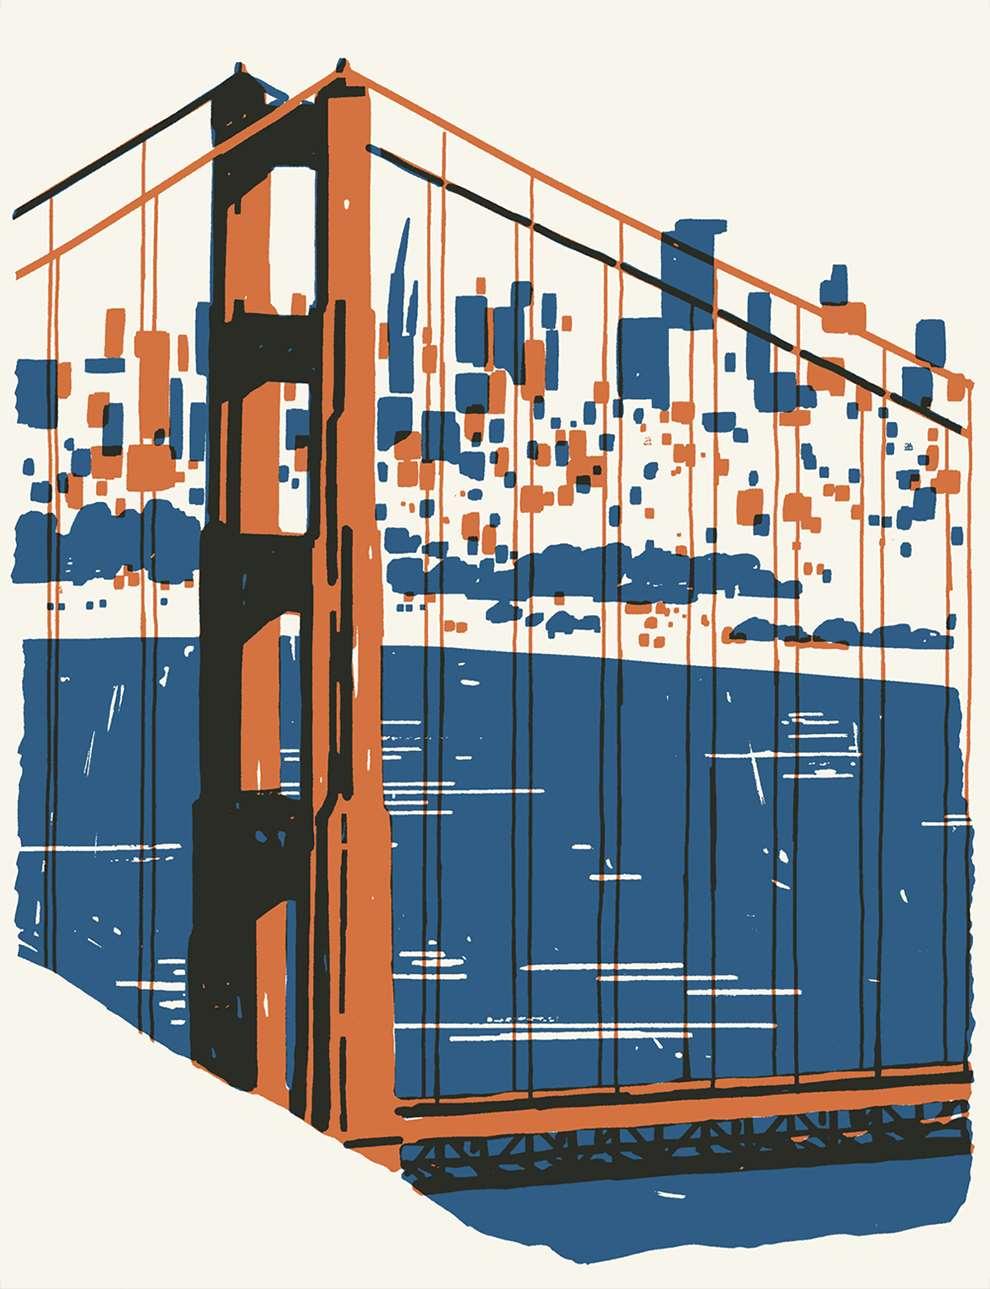 Harry Tennant, Digital illustration of Golden Gate Bridge, textural style.